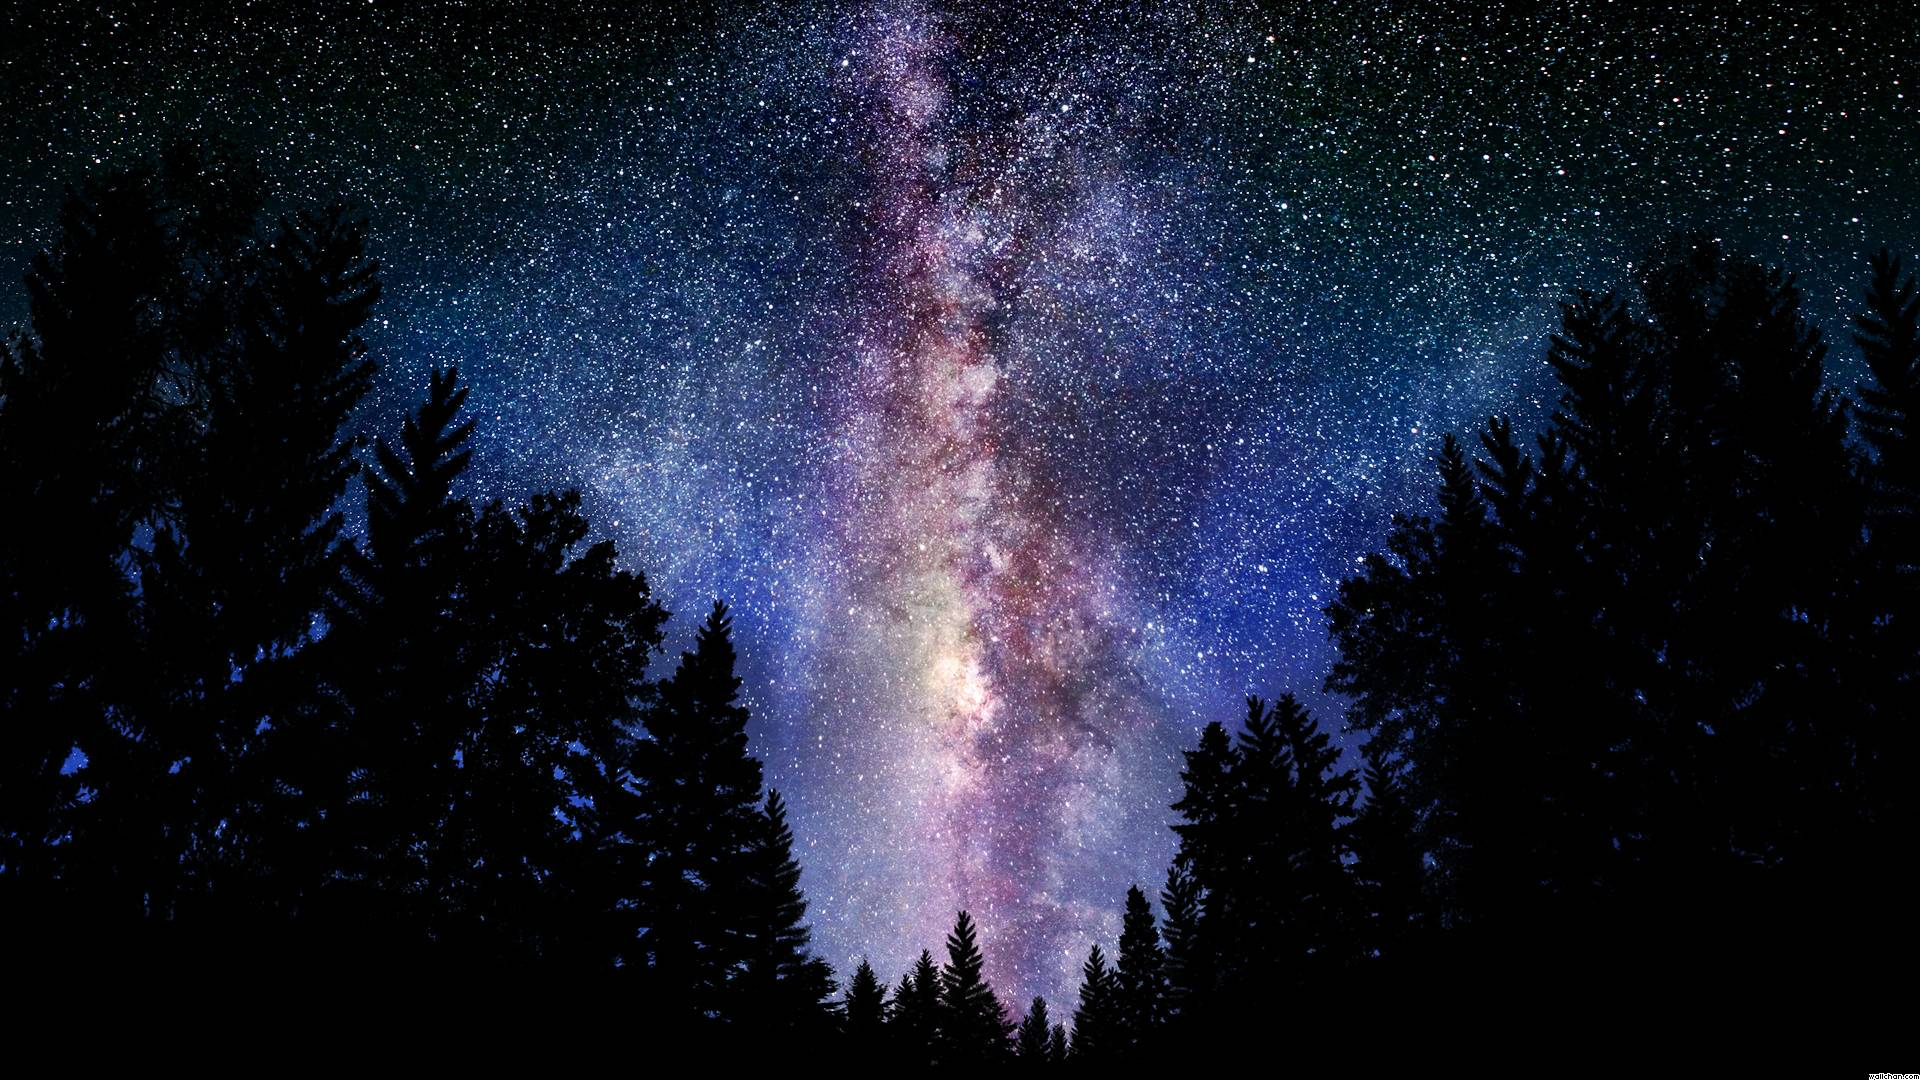 Milky Way Wallpaper 1920x1080 71 Images: Milky Way Galaxy Wallpaper